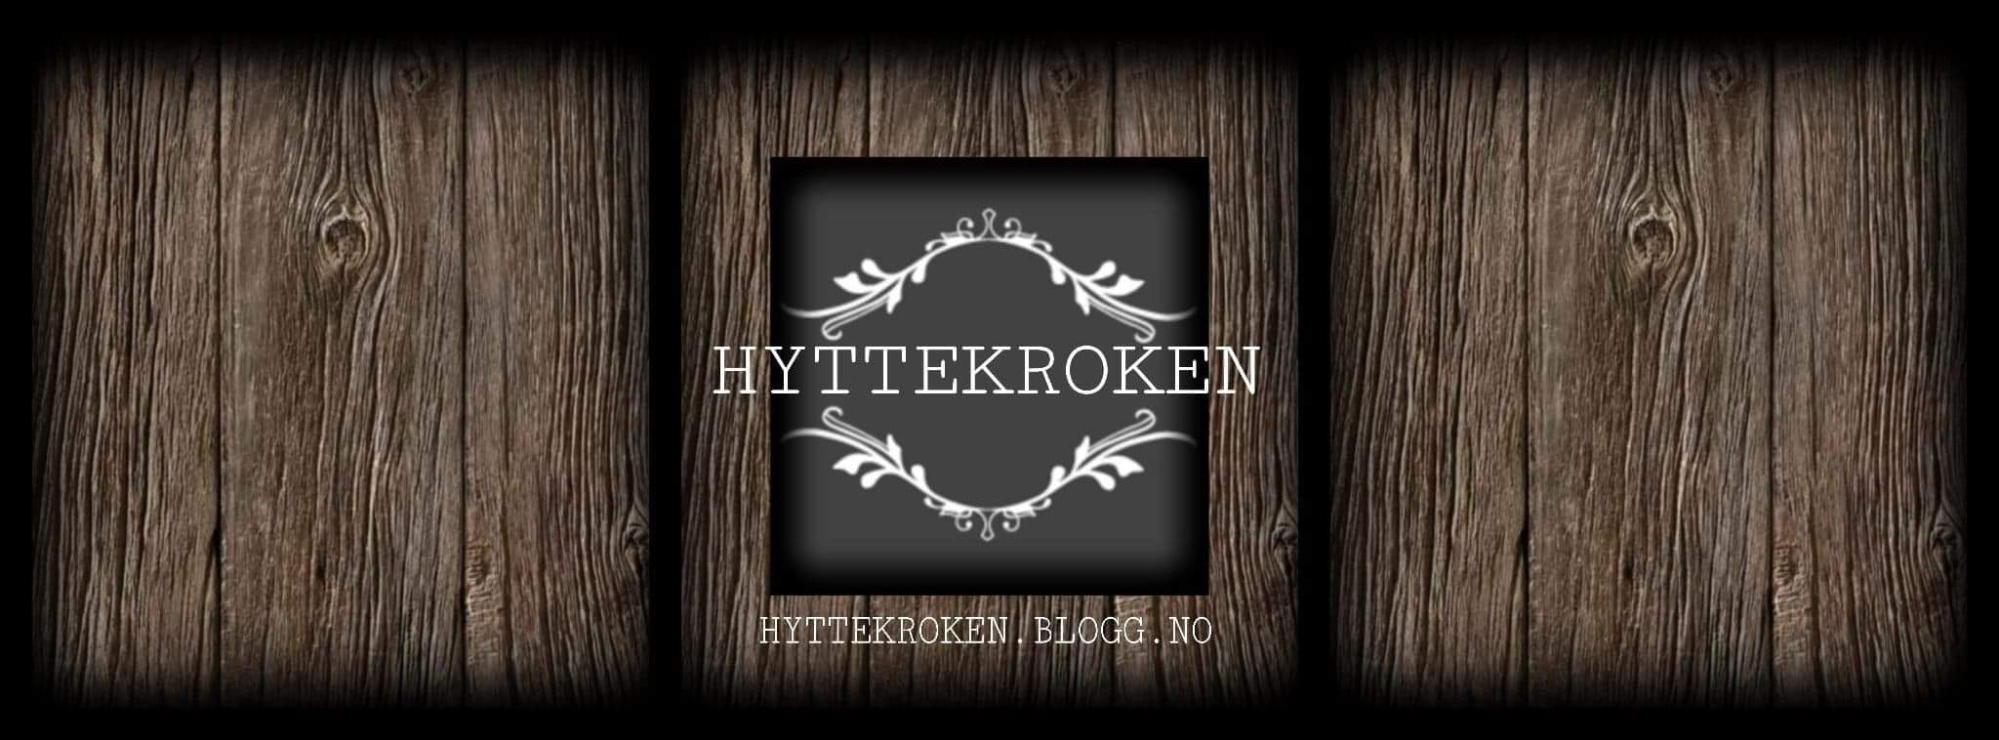 HYTTEKROKEN